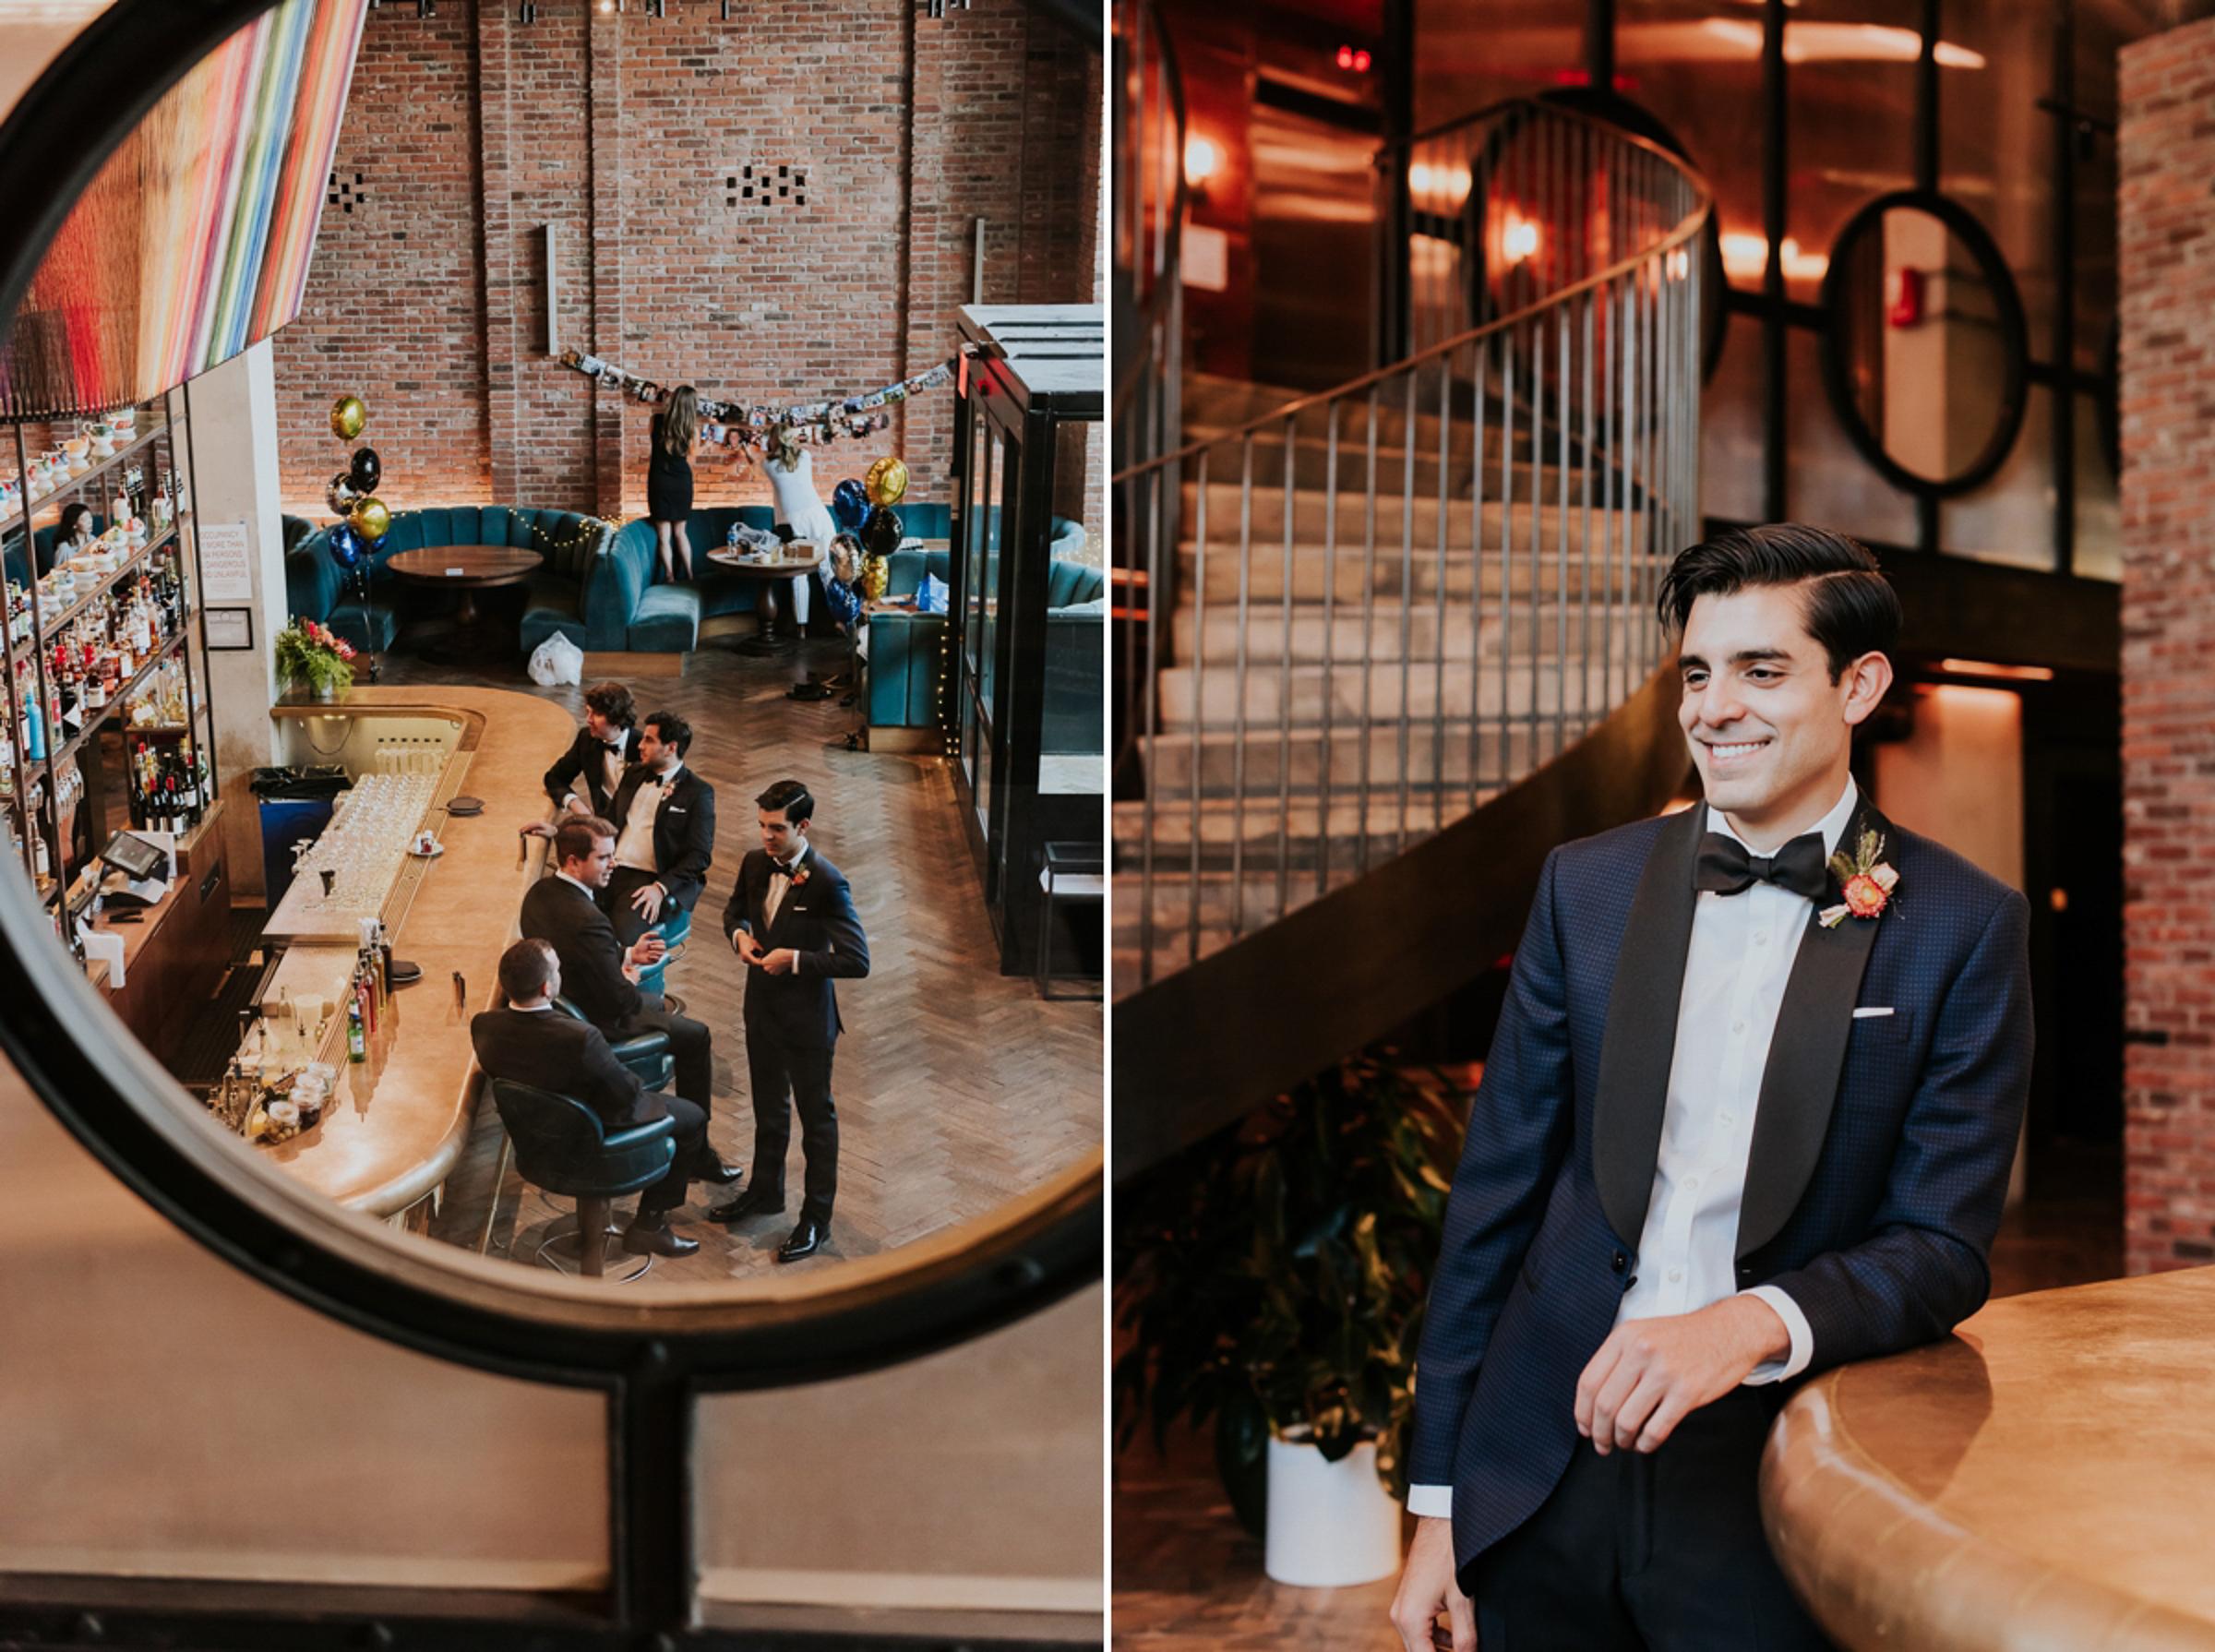 Brooklyn-Winery-NYC-Editorial-Documentary-Wedding-Photographer-Gina-Oli-119.jpg